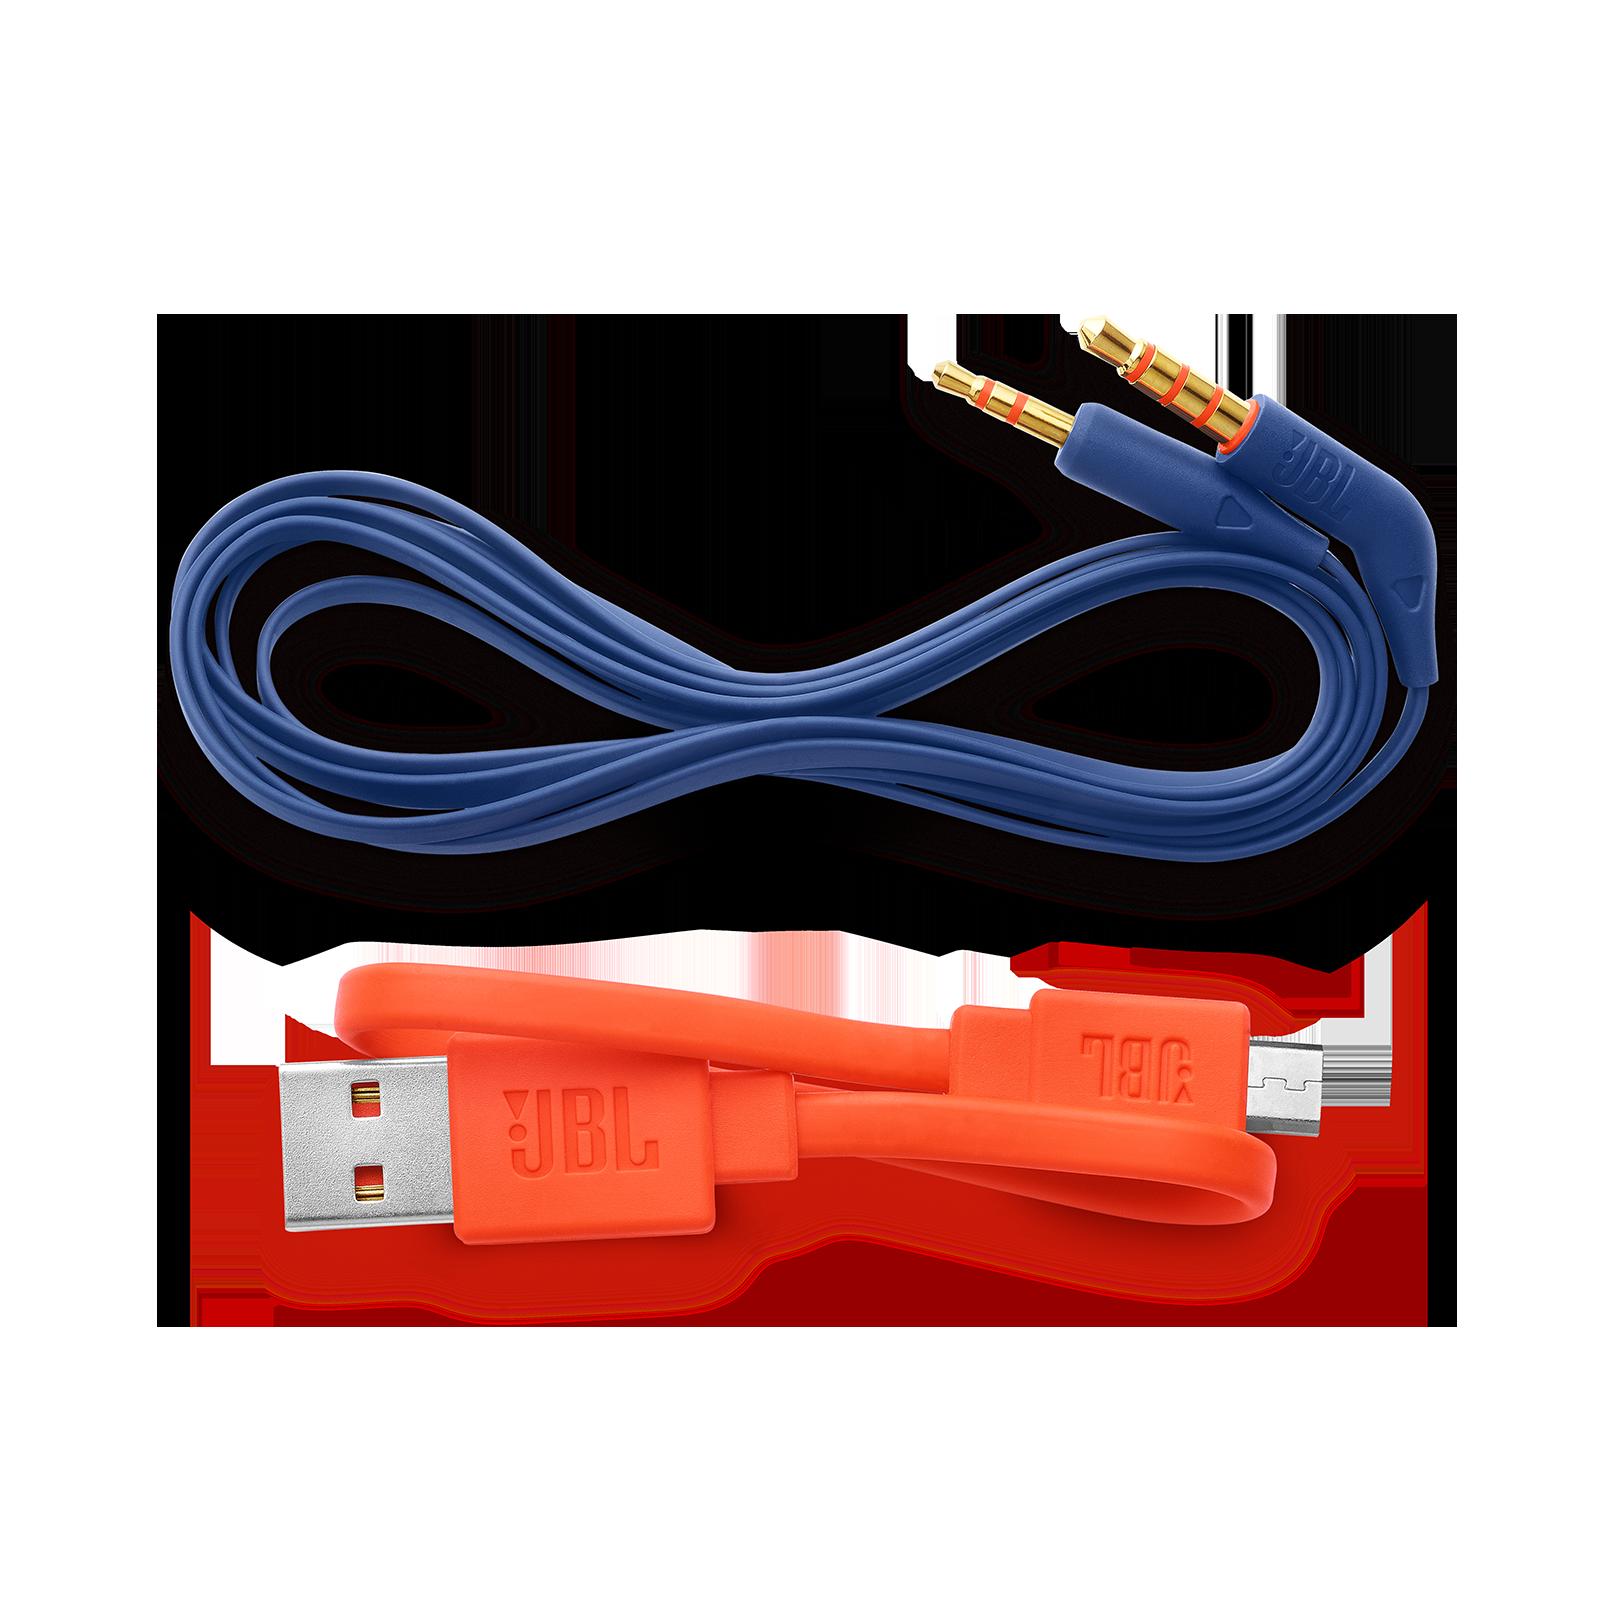 JBL TUNE 600BTNC - Blue - Wireless, on-ear, active noise-cancelling headphones. - Detailshot 5